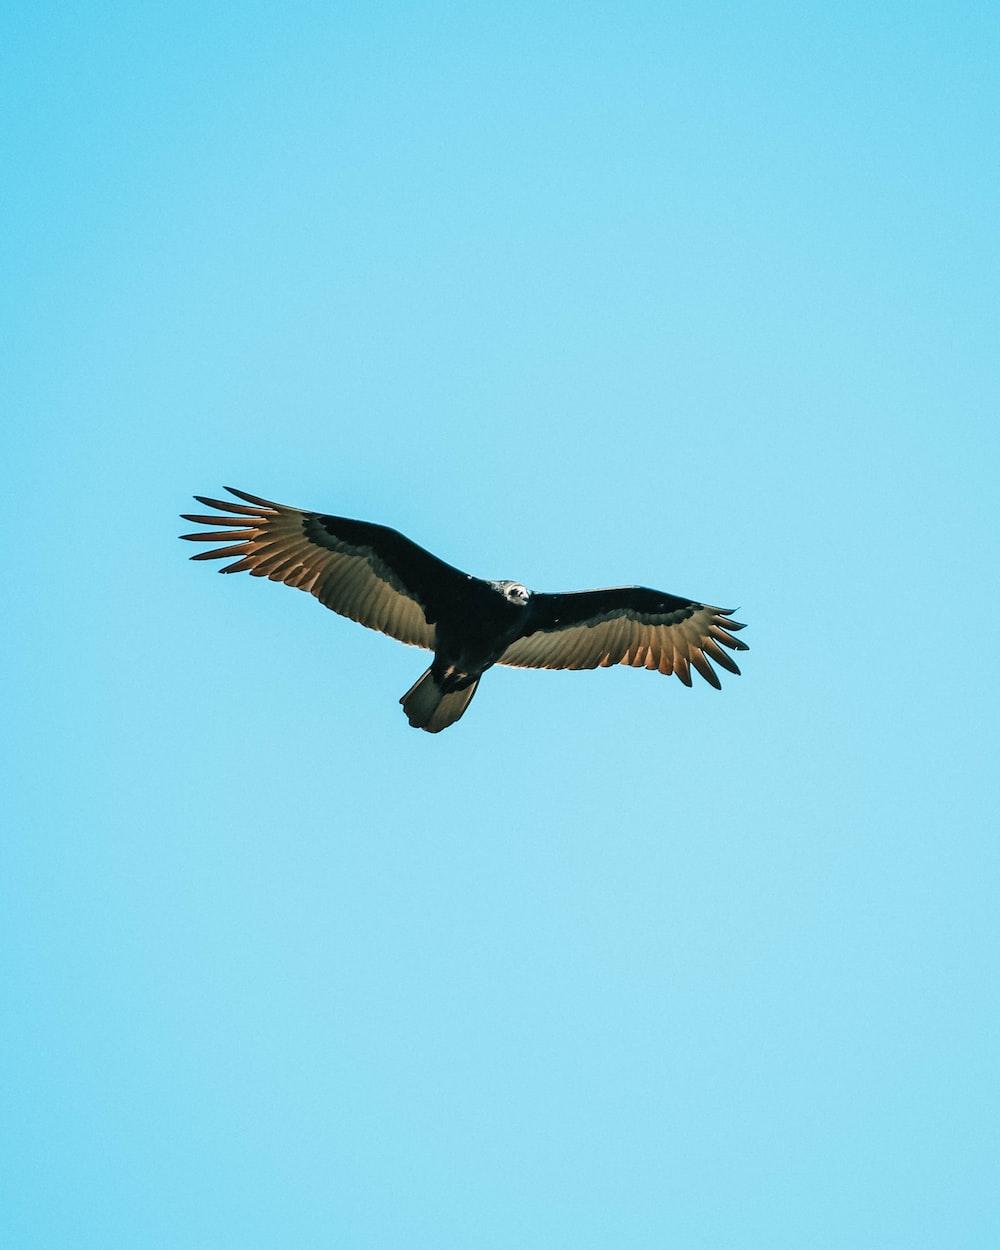 black and grey eagle on flight under clear blue sky